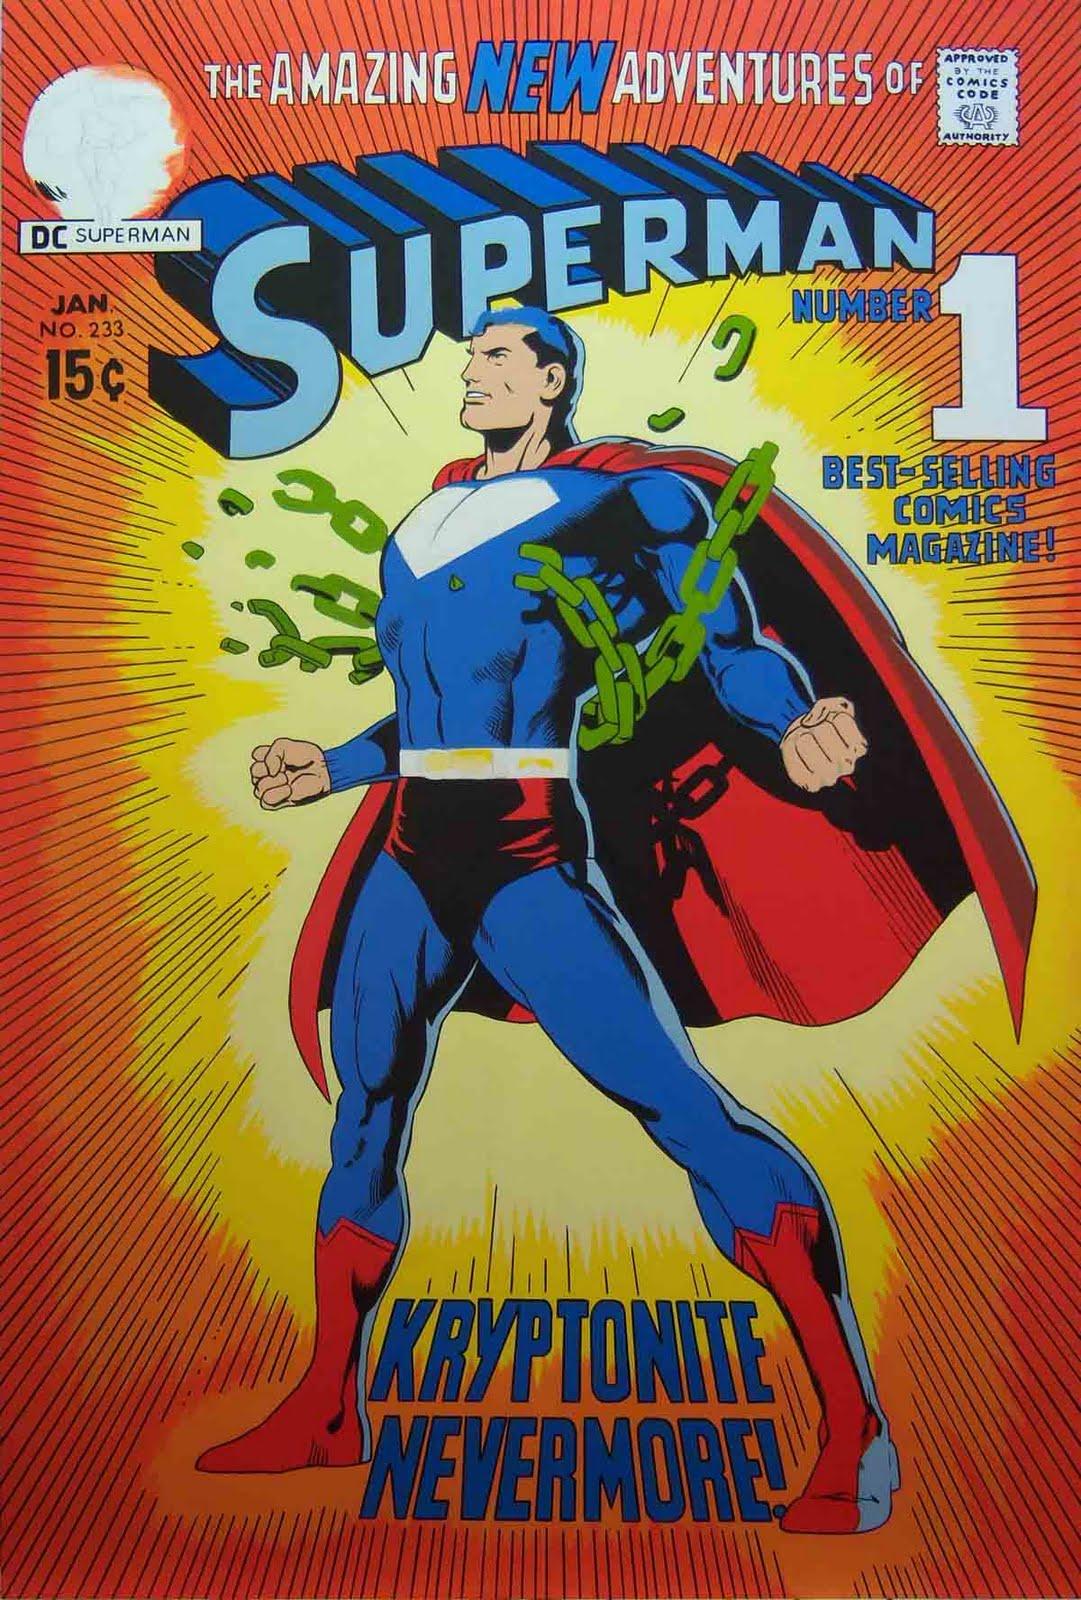 Superman Comic Book Cover Art : The john douglas mostly comic book art site superman